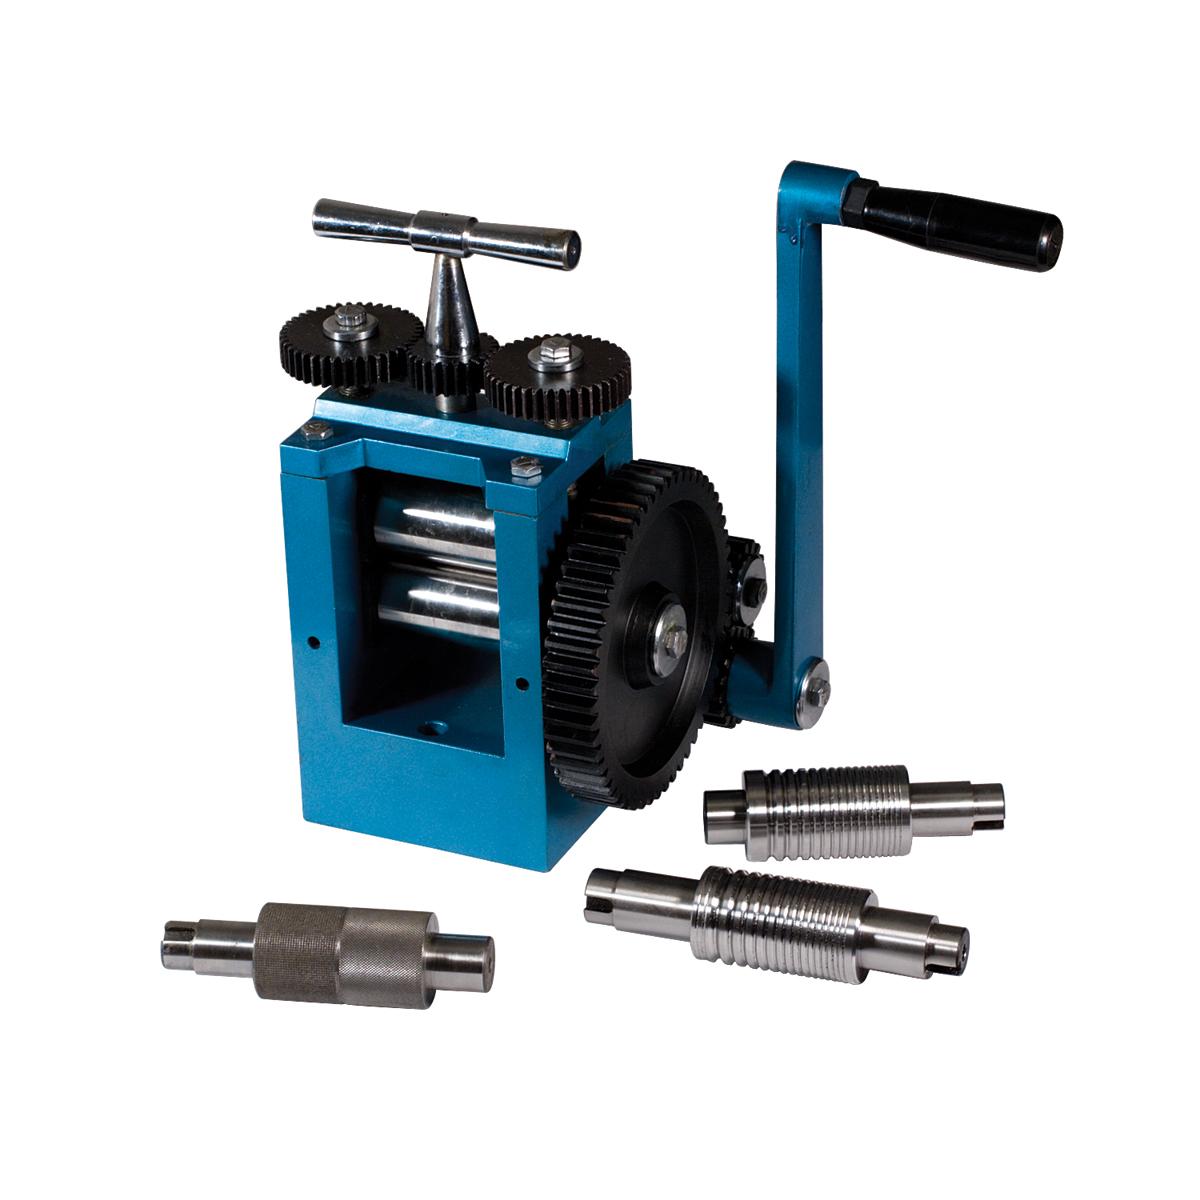 Mil 280 10 Rolling Mill 80 Millimeters